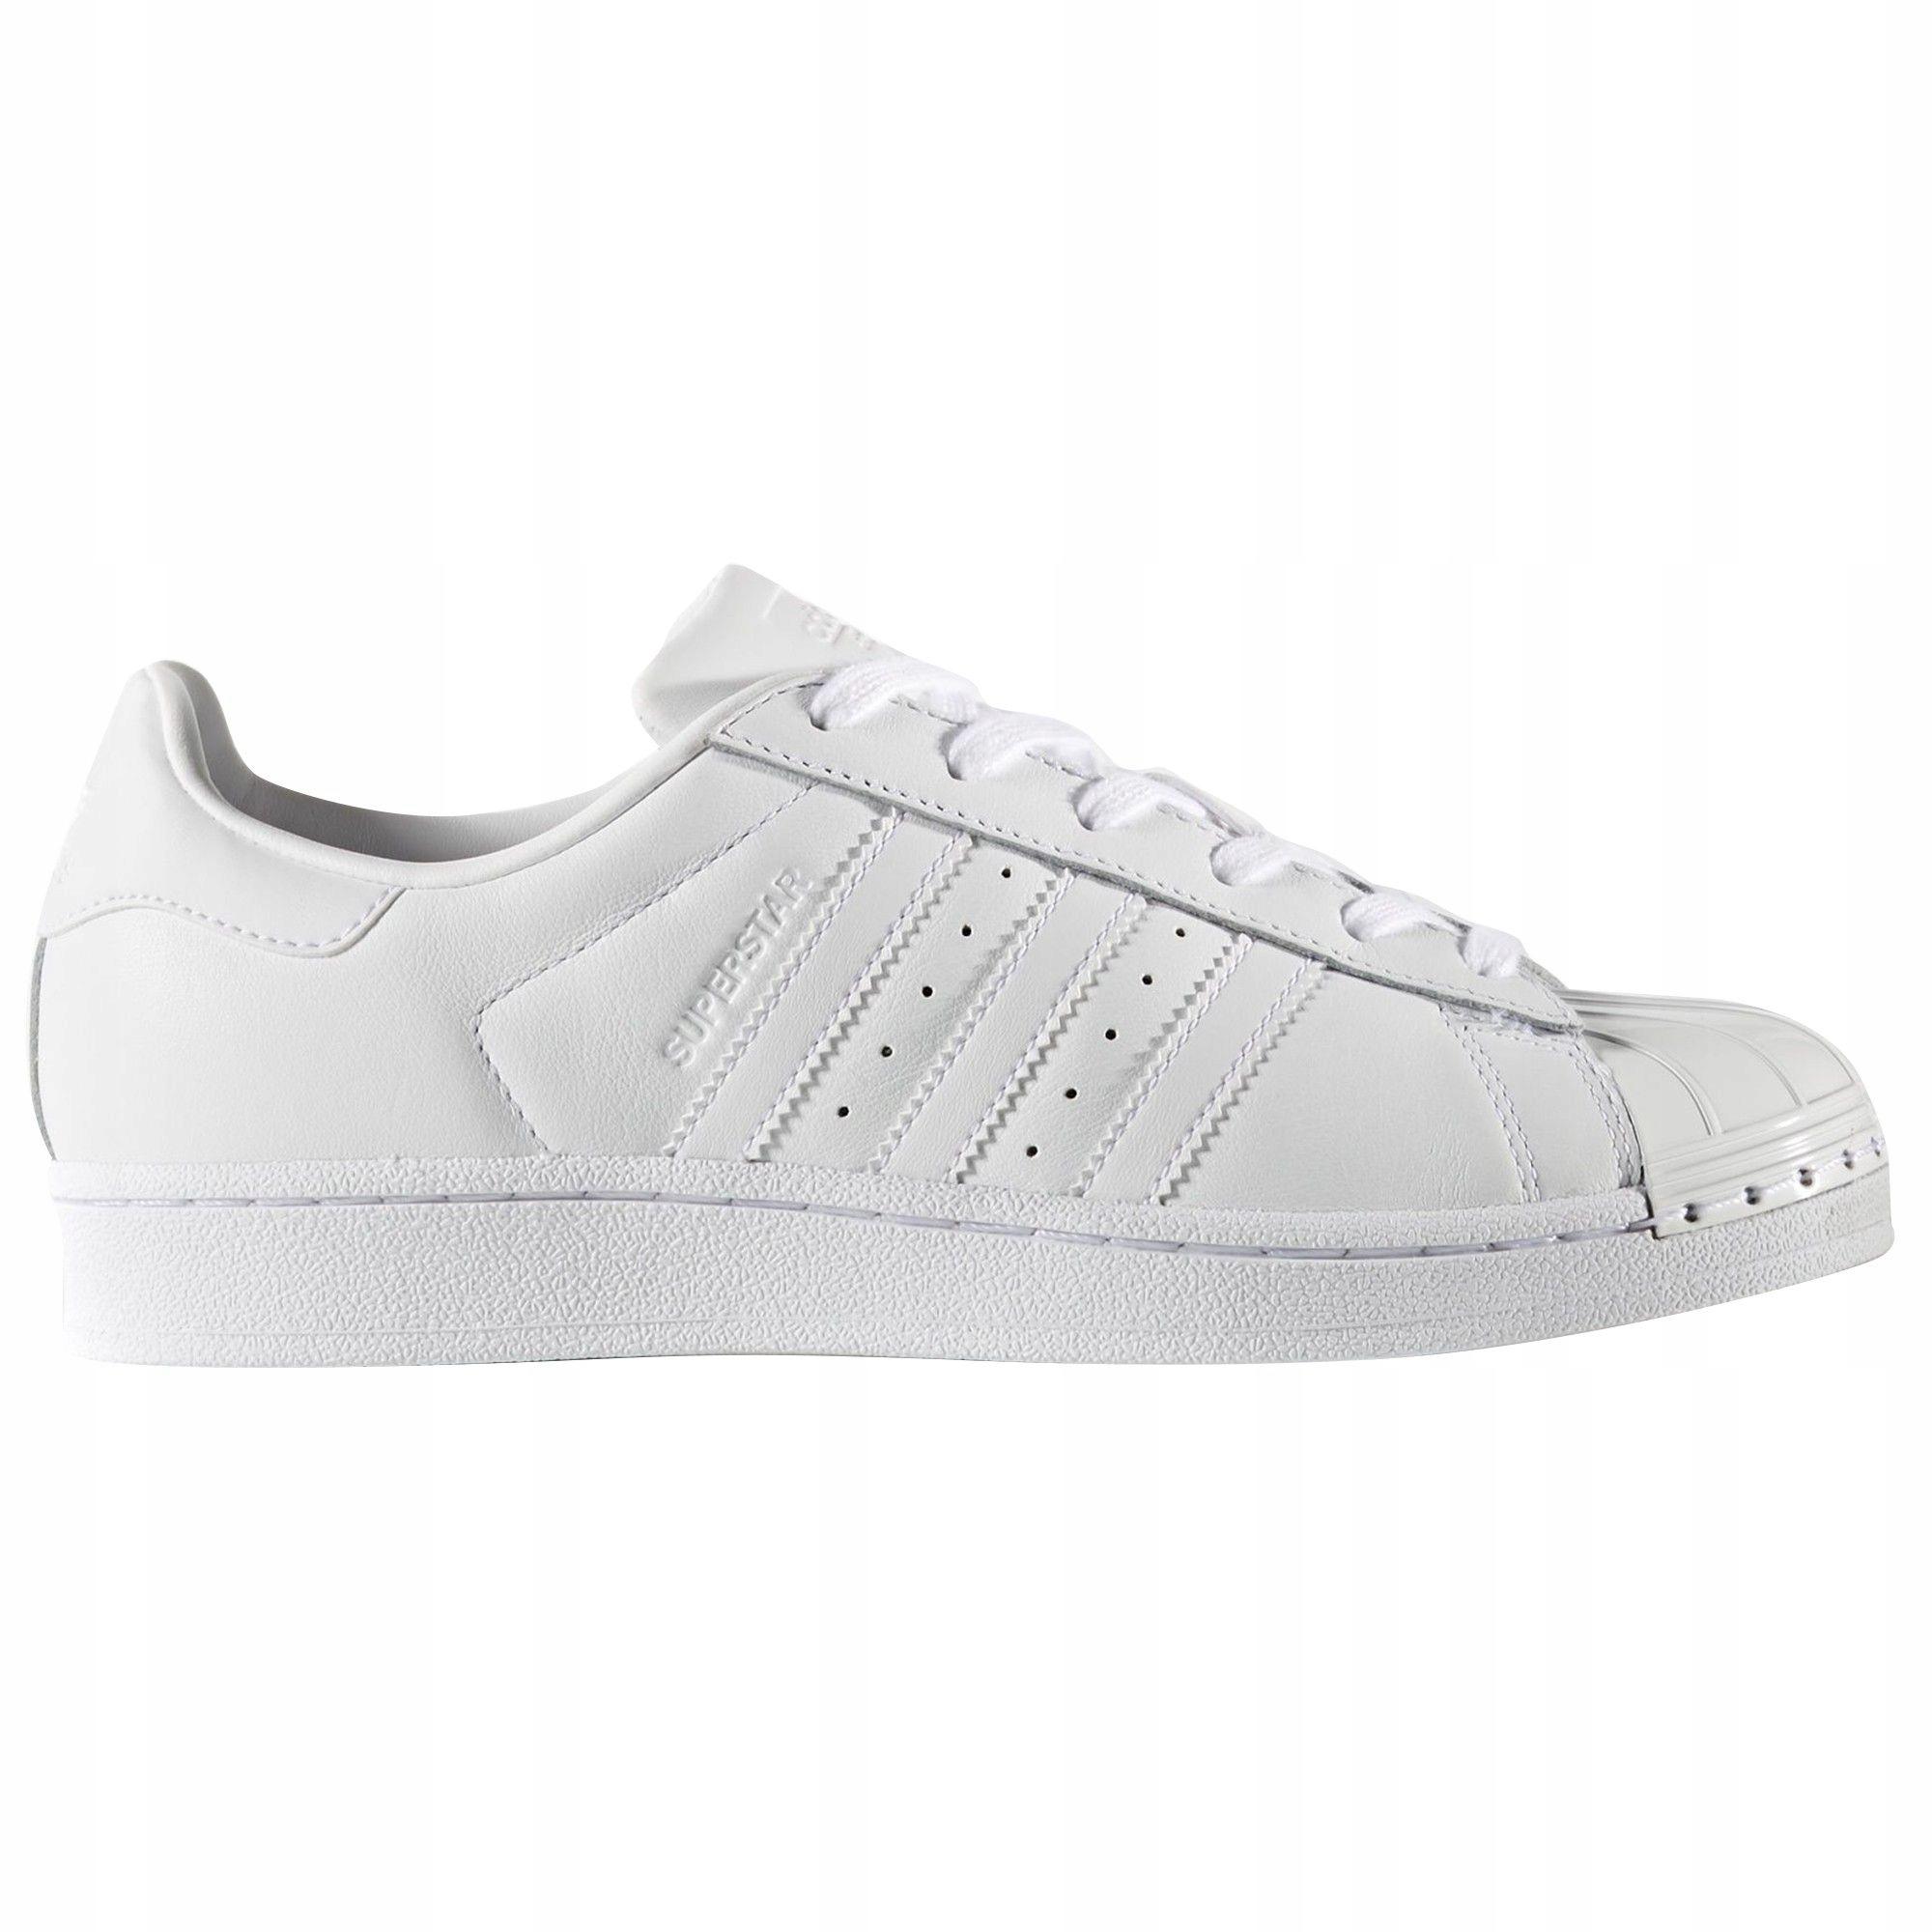 ... 7545f46326c5 adidas Superstar 80s BY9751 buty damskie r 40 - 7401491609  - oficjalne archiwum allegro ... d69fd90a7790f